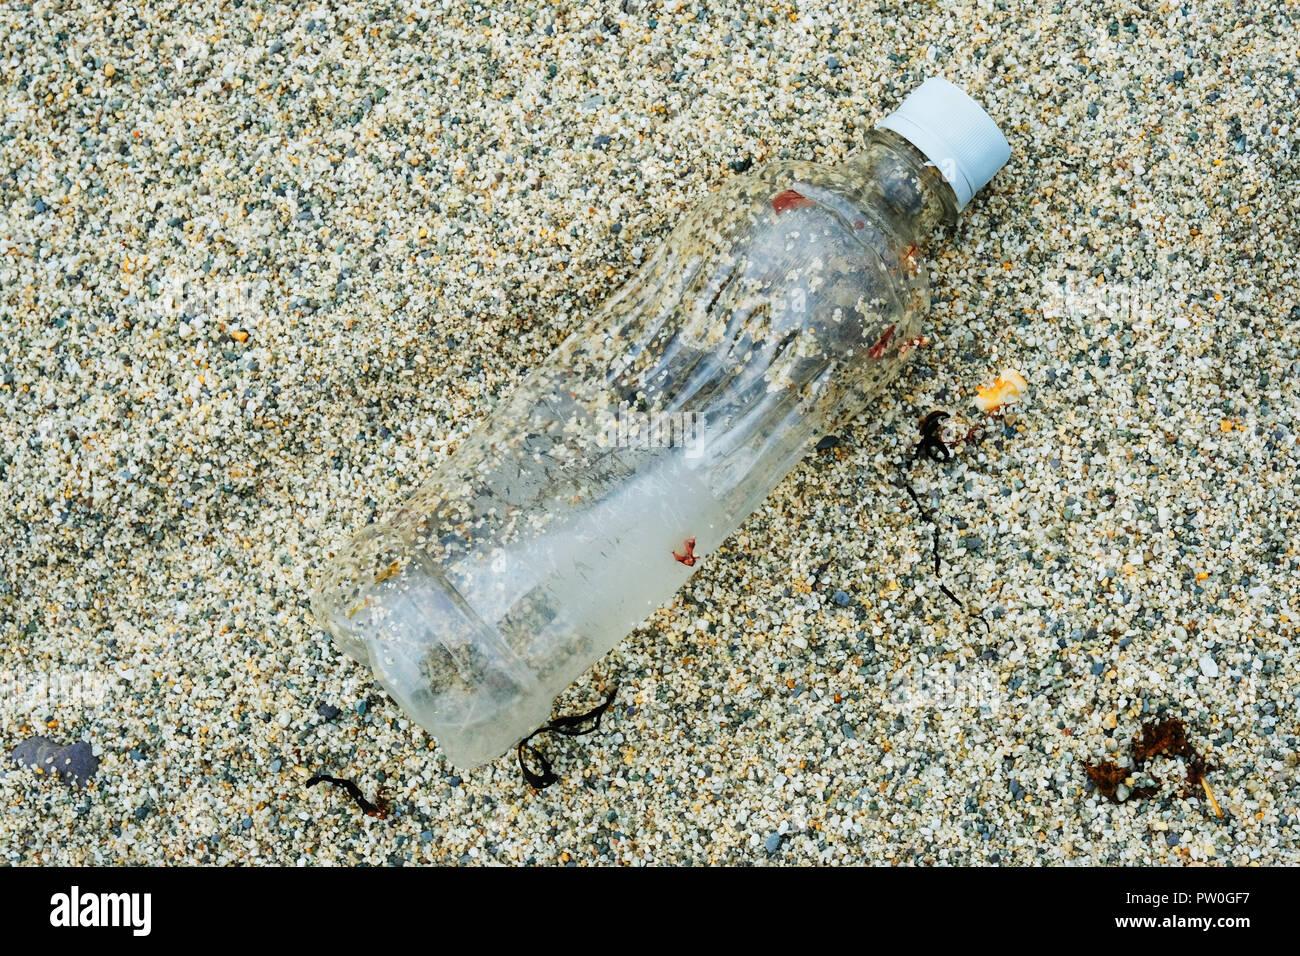 Single plastic bottle left on a sandy beach - John Gollop - Stock Image